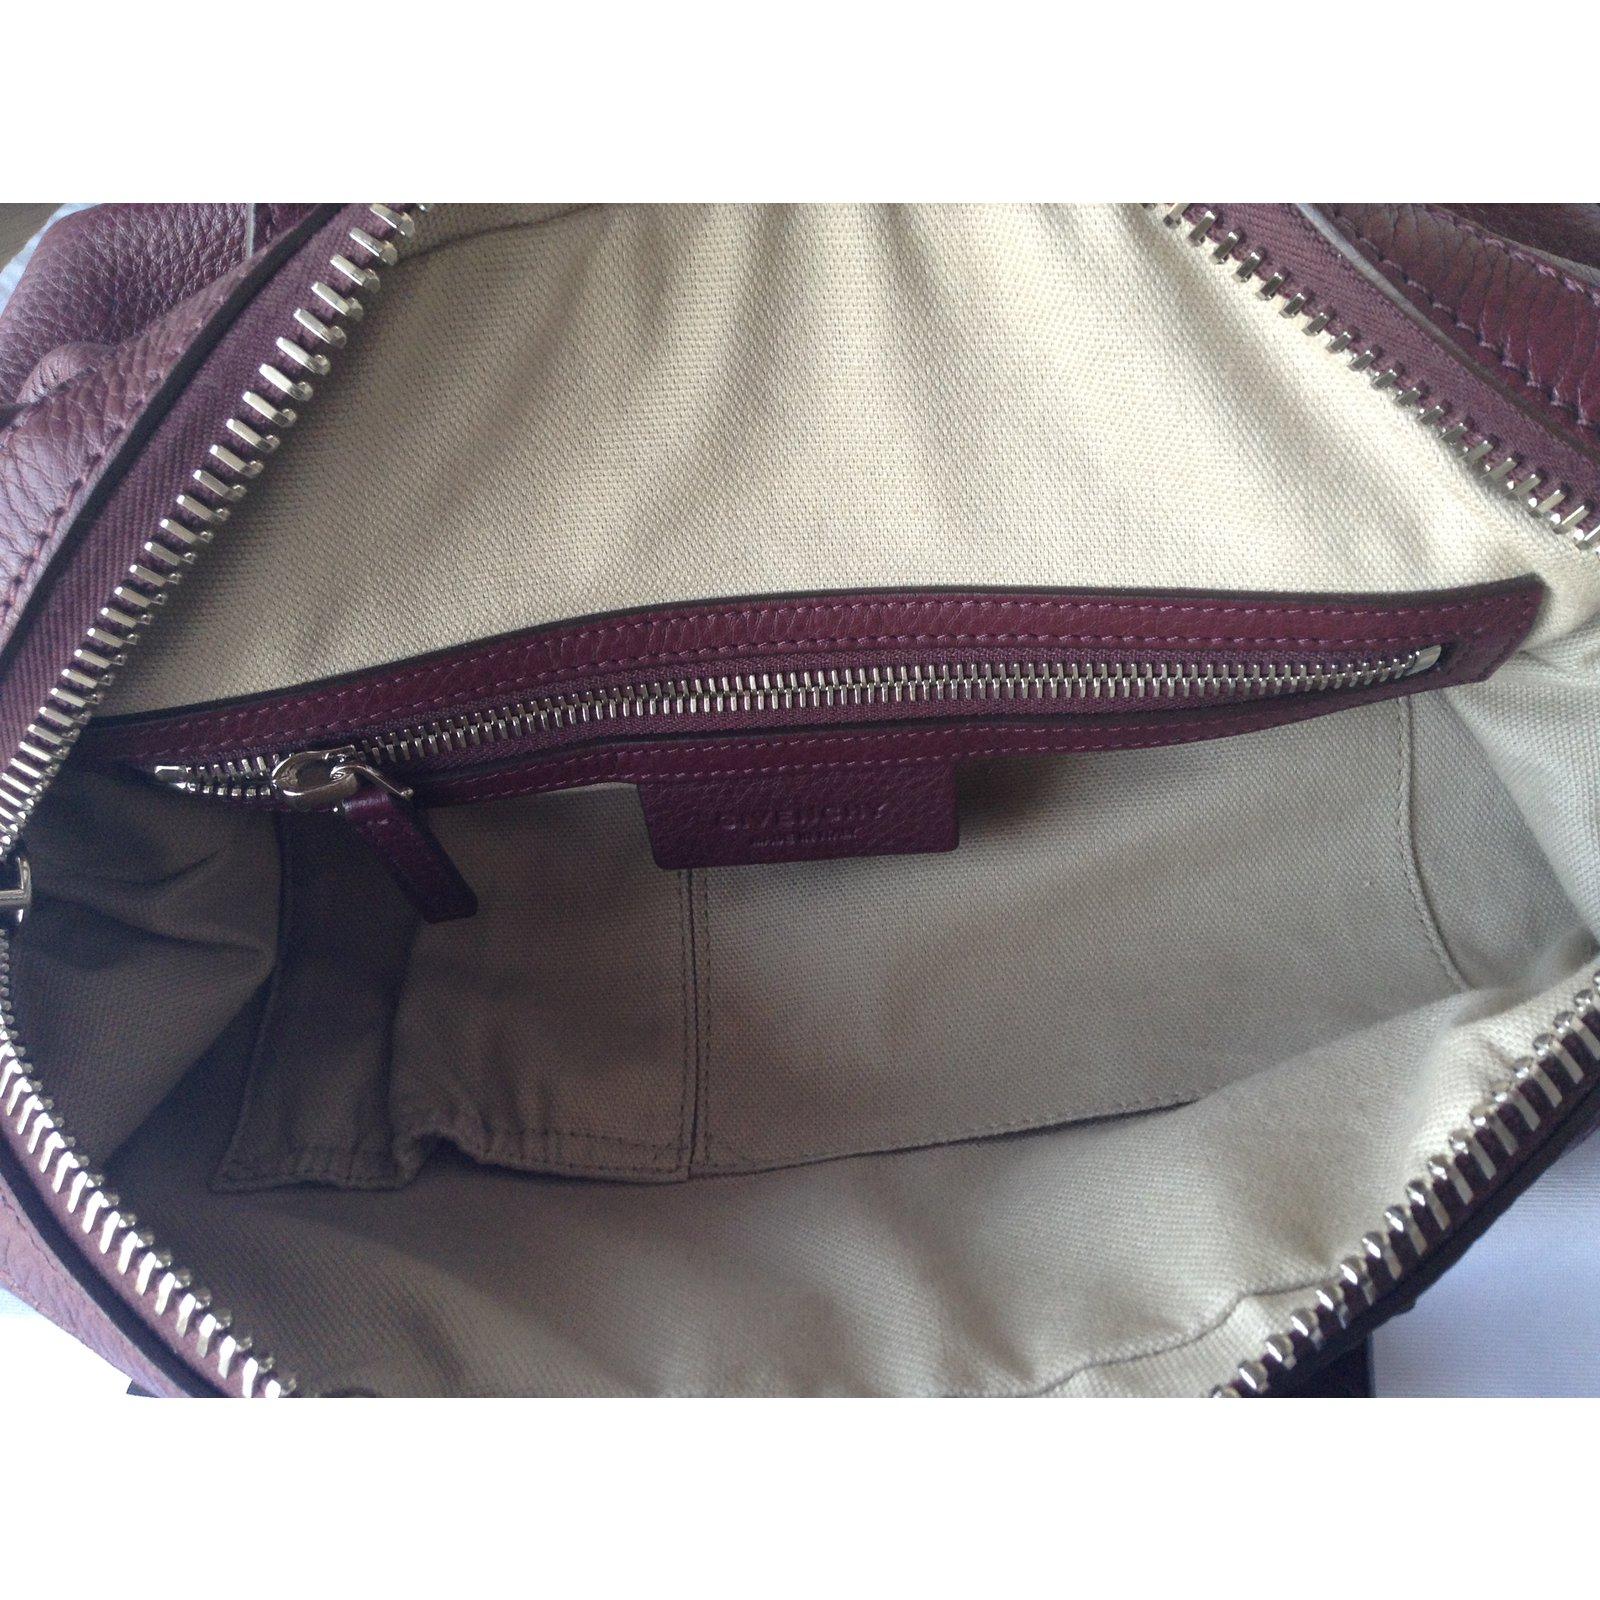 5a12ddb6b7 Facebook · Pin This. Givenchy Handbag Handbags Leather Dark red ref.27047